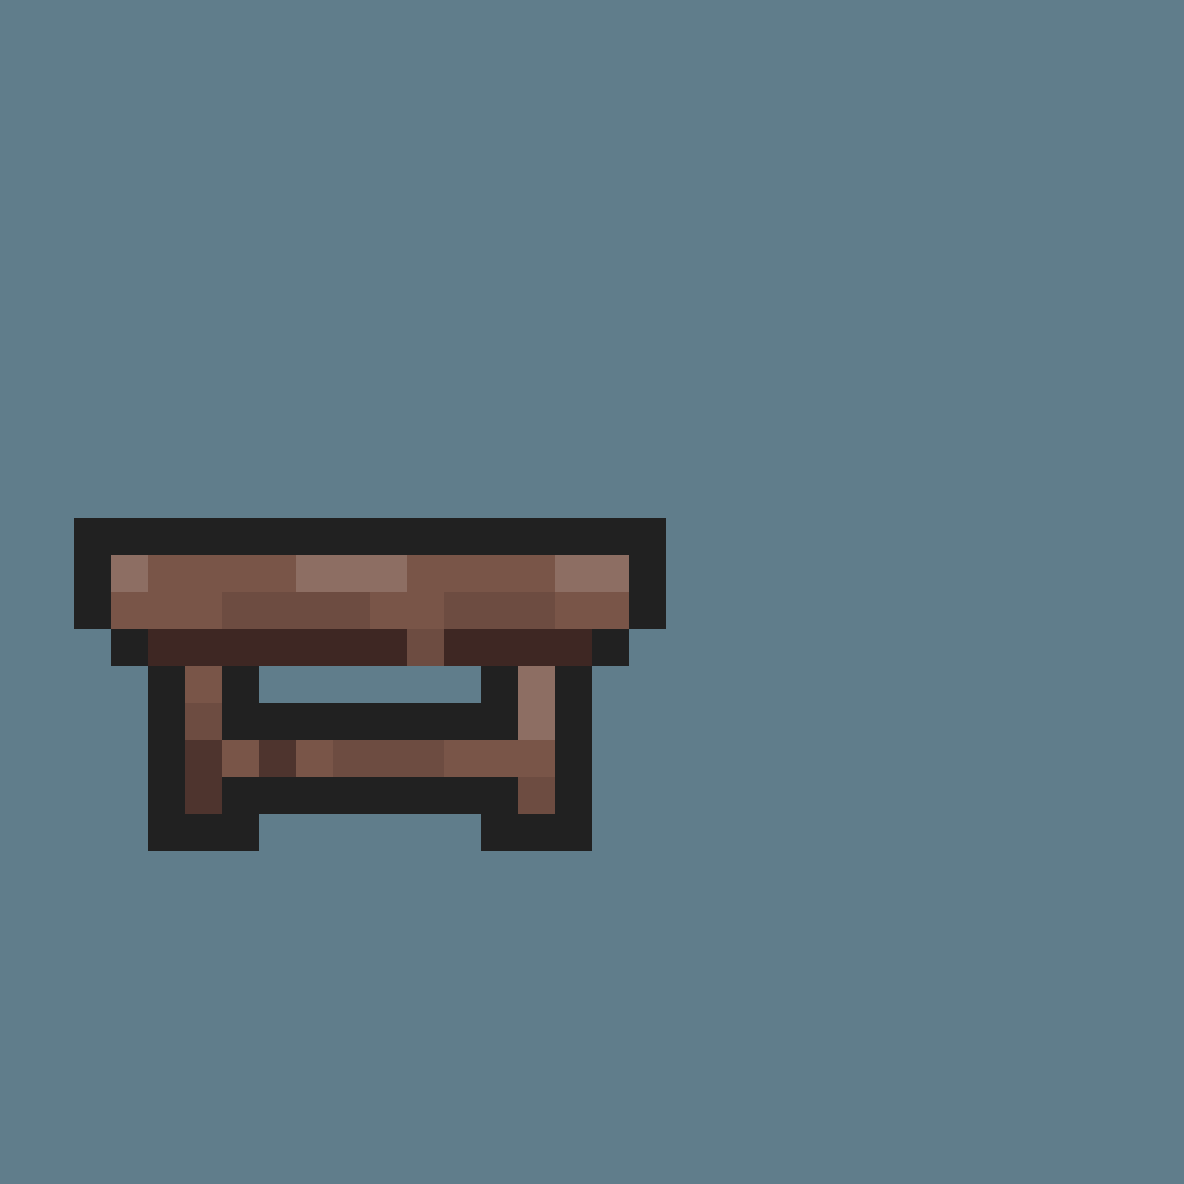 Fabulous Pixilart Terraria Workbench By Reptox Ncnpc Chair Design For Home Ncnpcorg